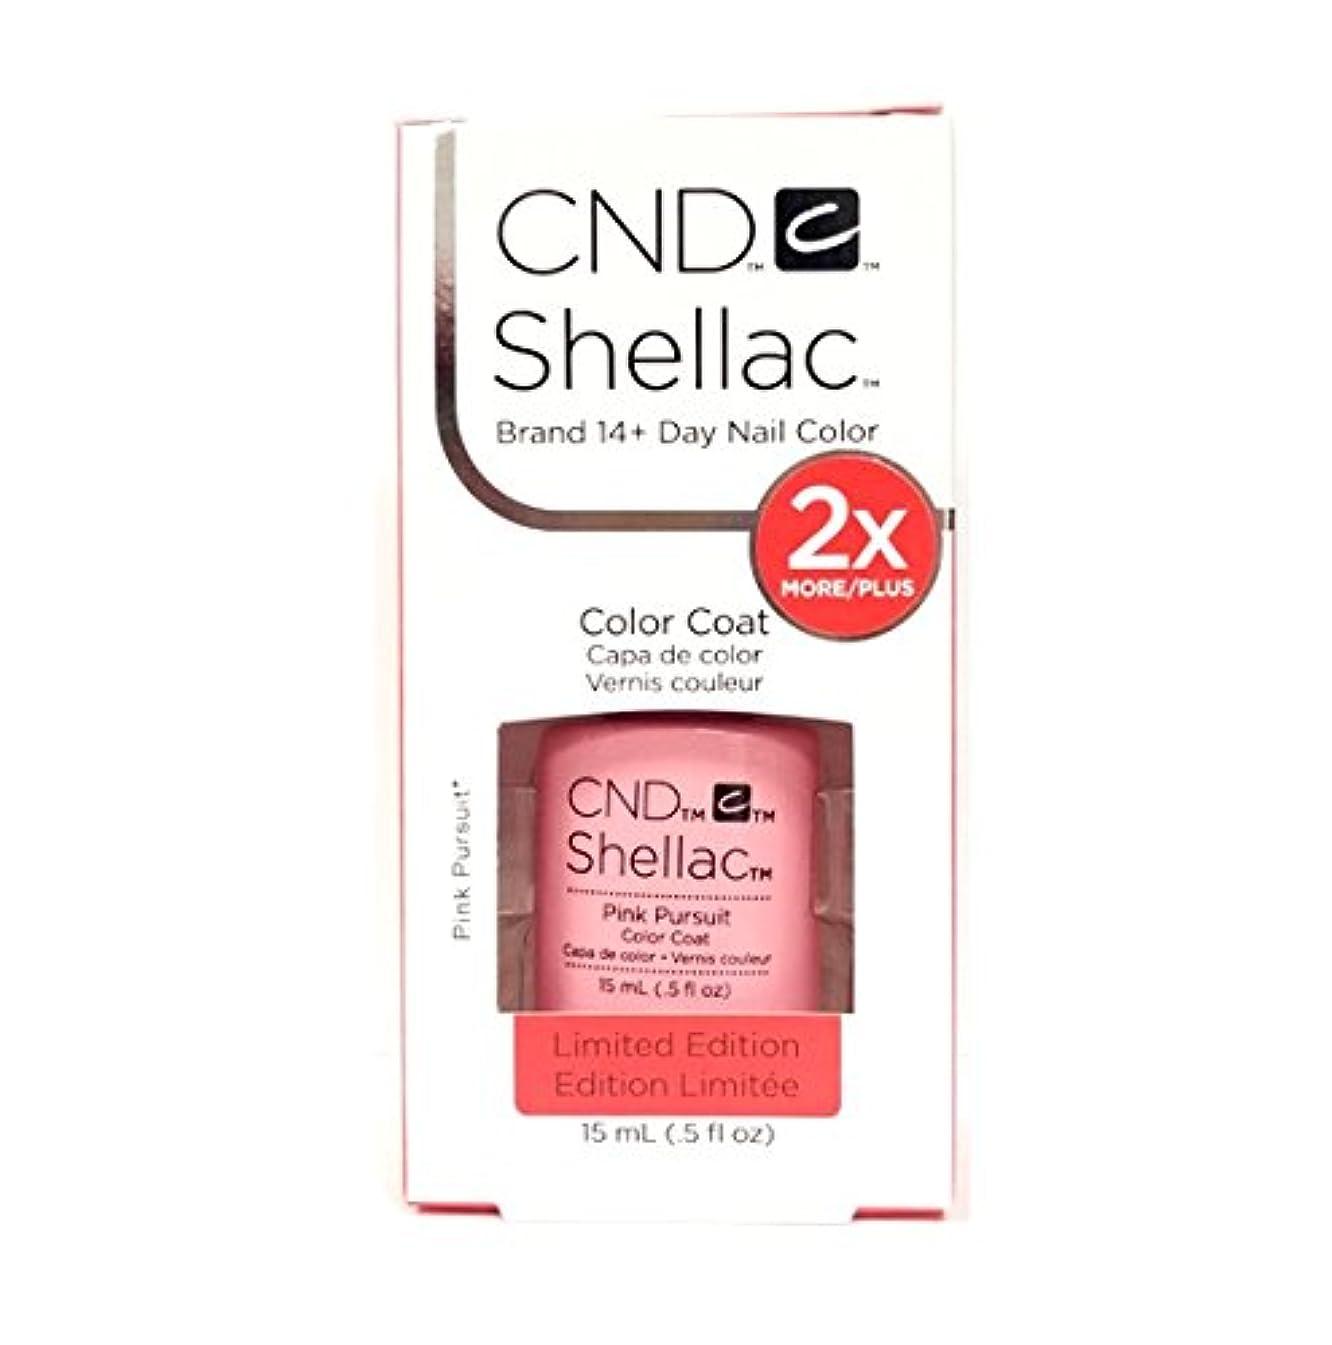 CND Shellac - Limited Edition! - Pink Pursuit - 15ml / 0.5oz